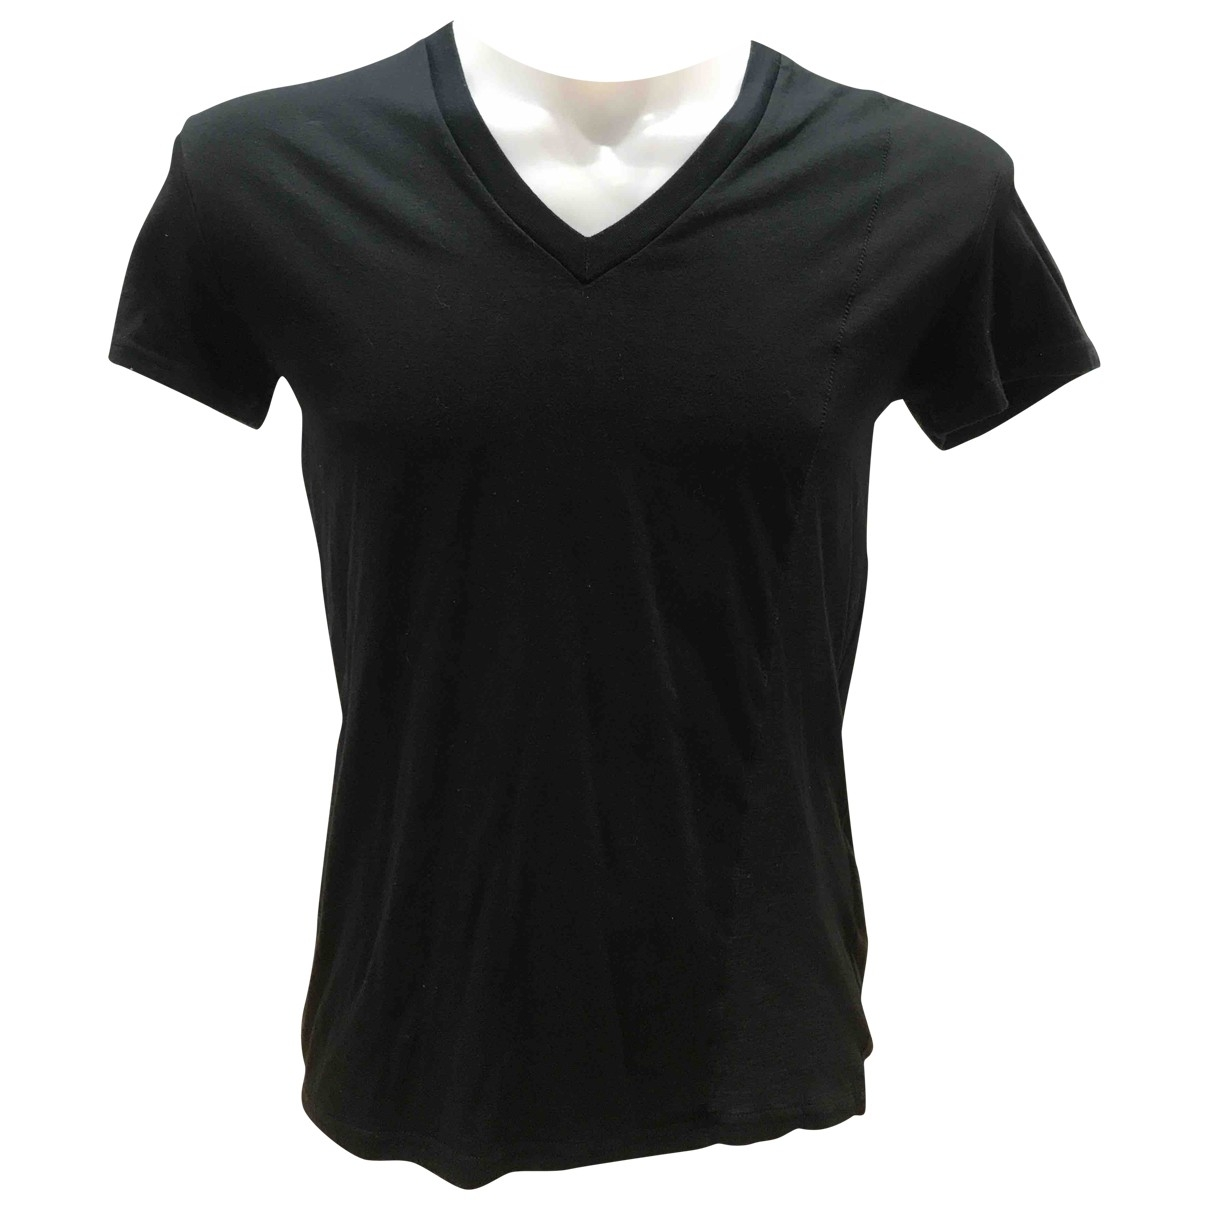 Dior Homme \N Black Cotton T-shirts for Men S International